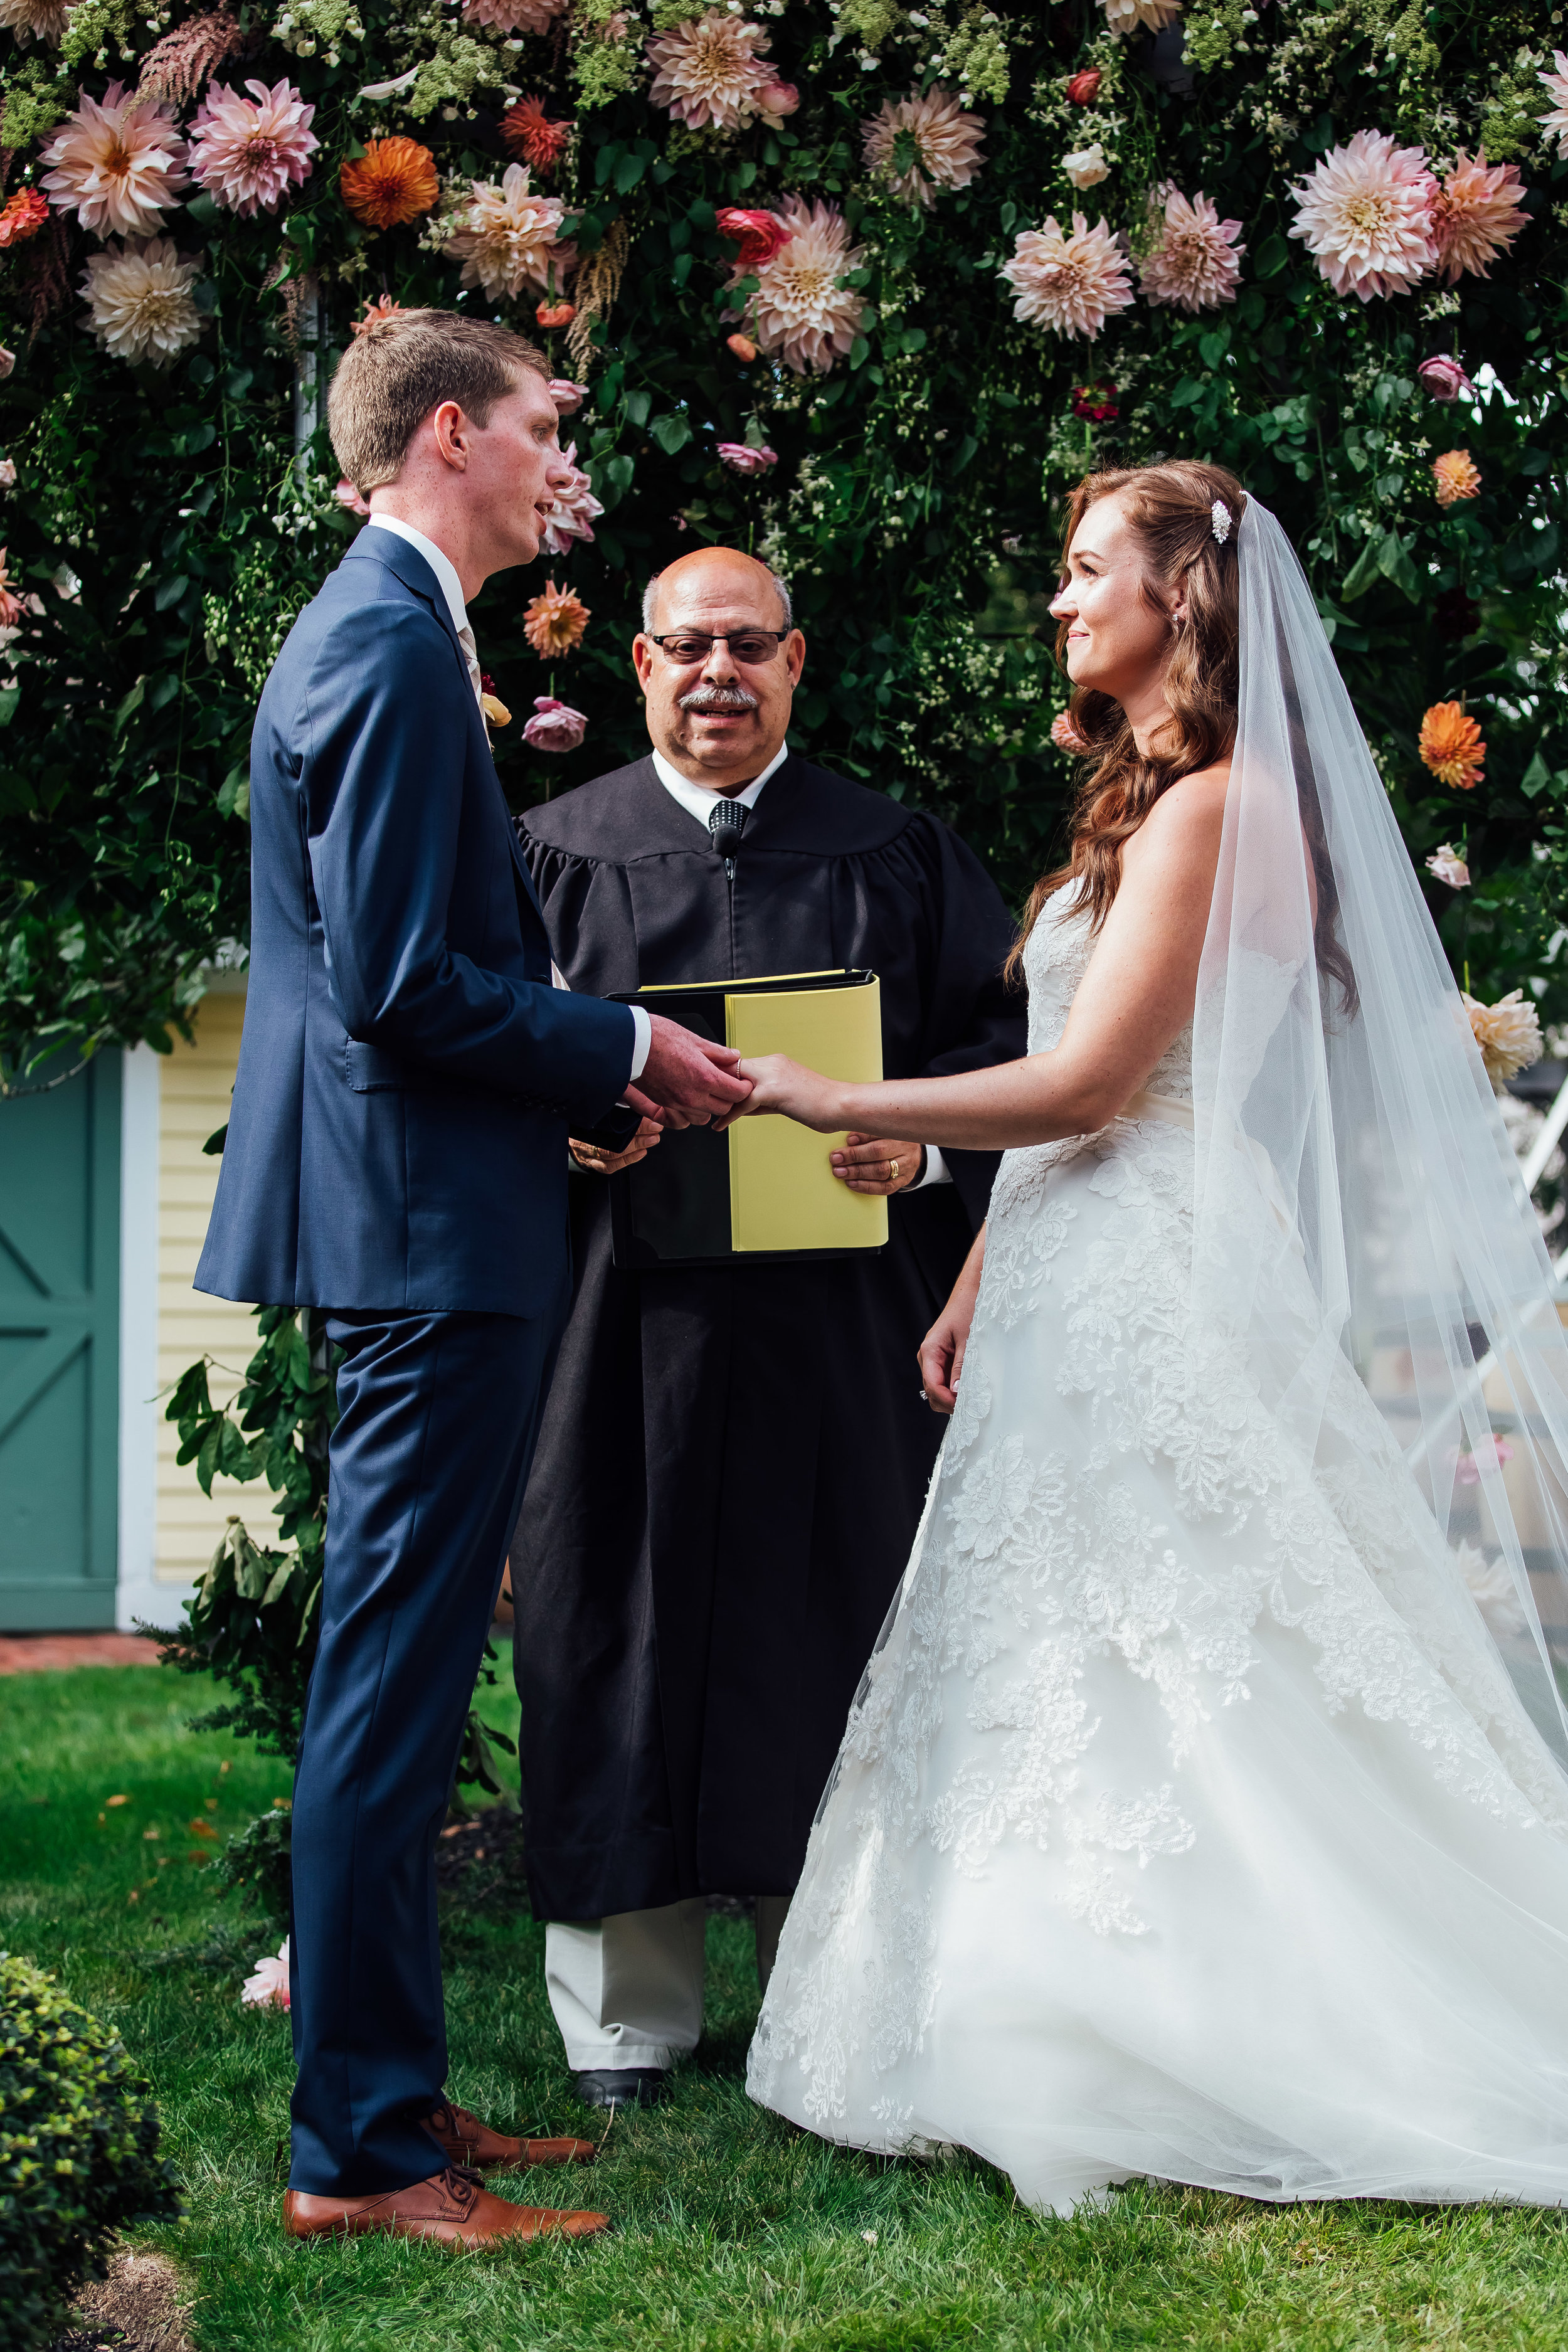 km-milton-backyard-wedding-9764.jpg